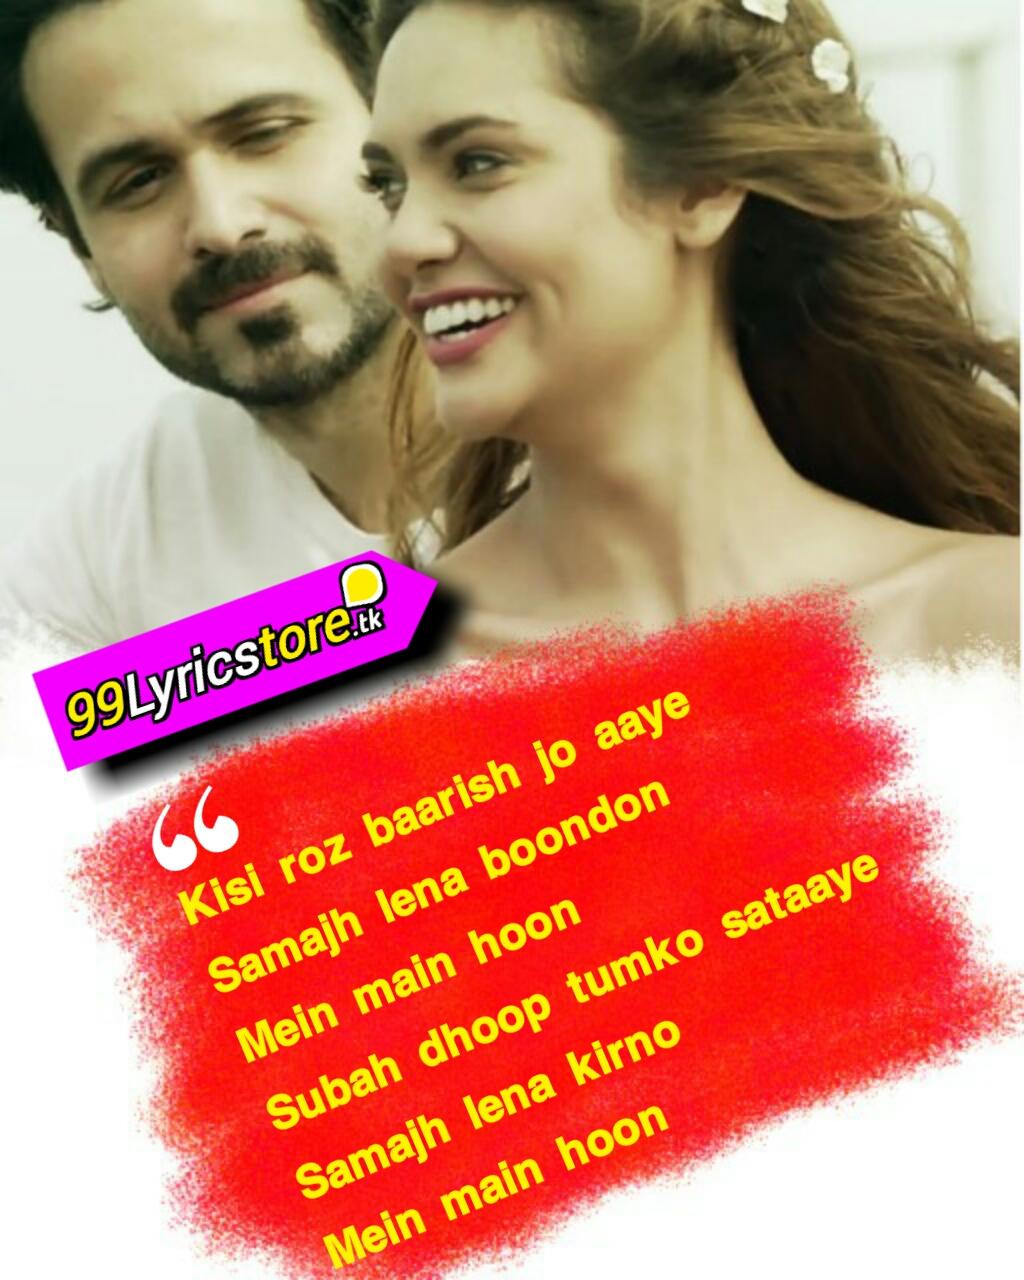 Bas itna hai tumse kehna Lyrics, Top Armaan Malik Song Lyrics, Hit Song Lyrics Of Armaan Malik, Hindi Song Lyrics, Emraan Hashmi Song Lyrics